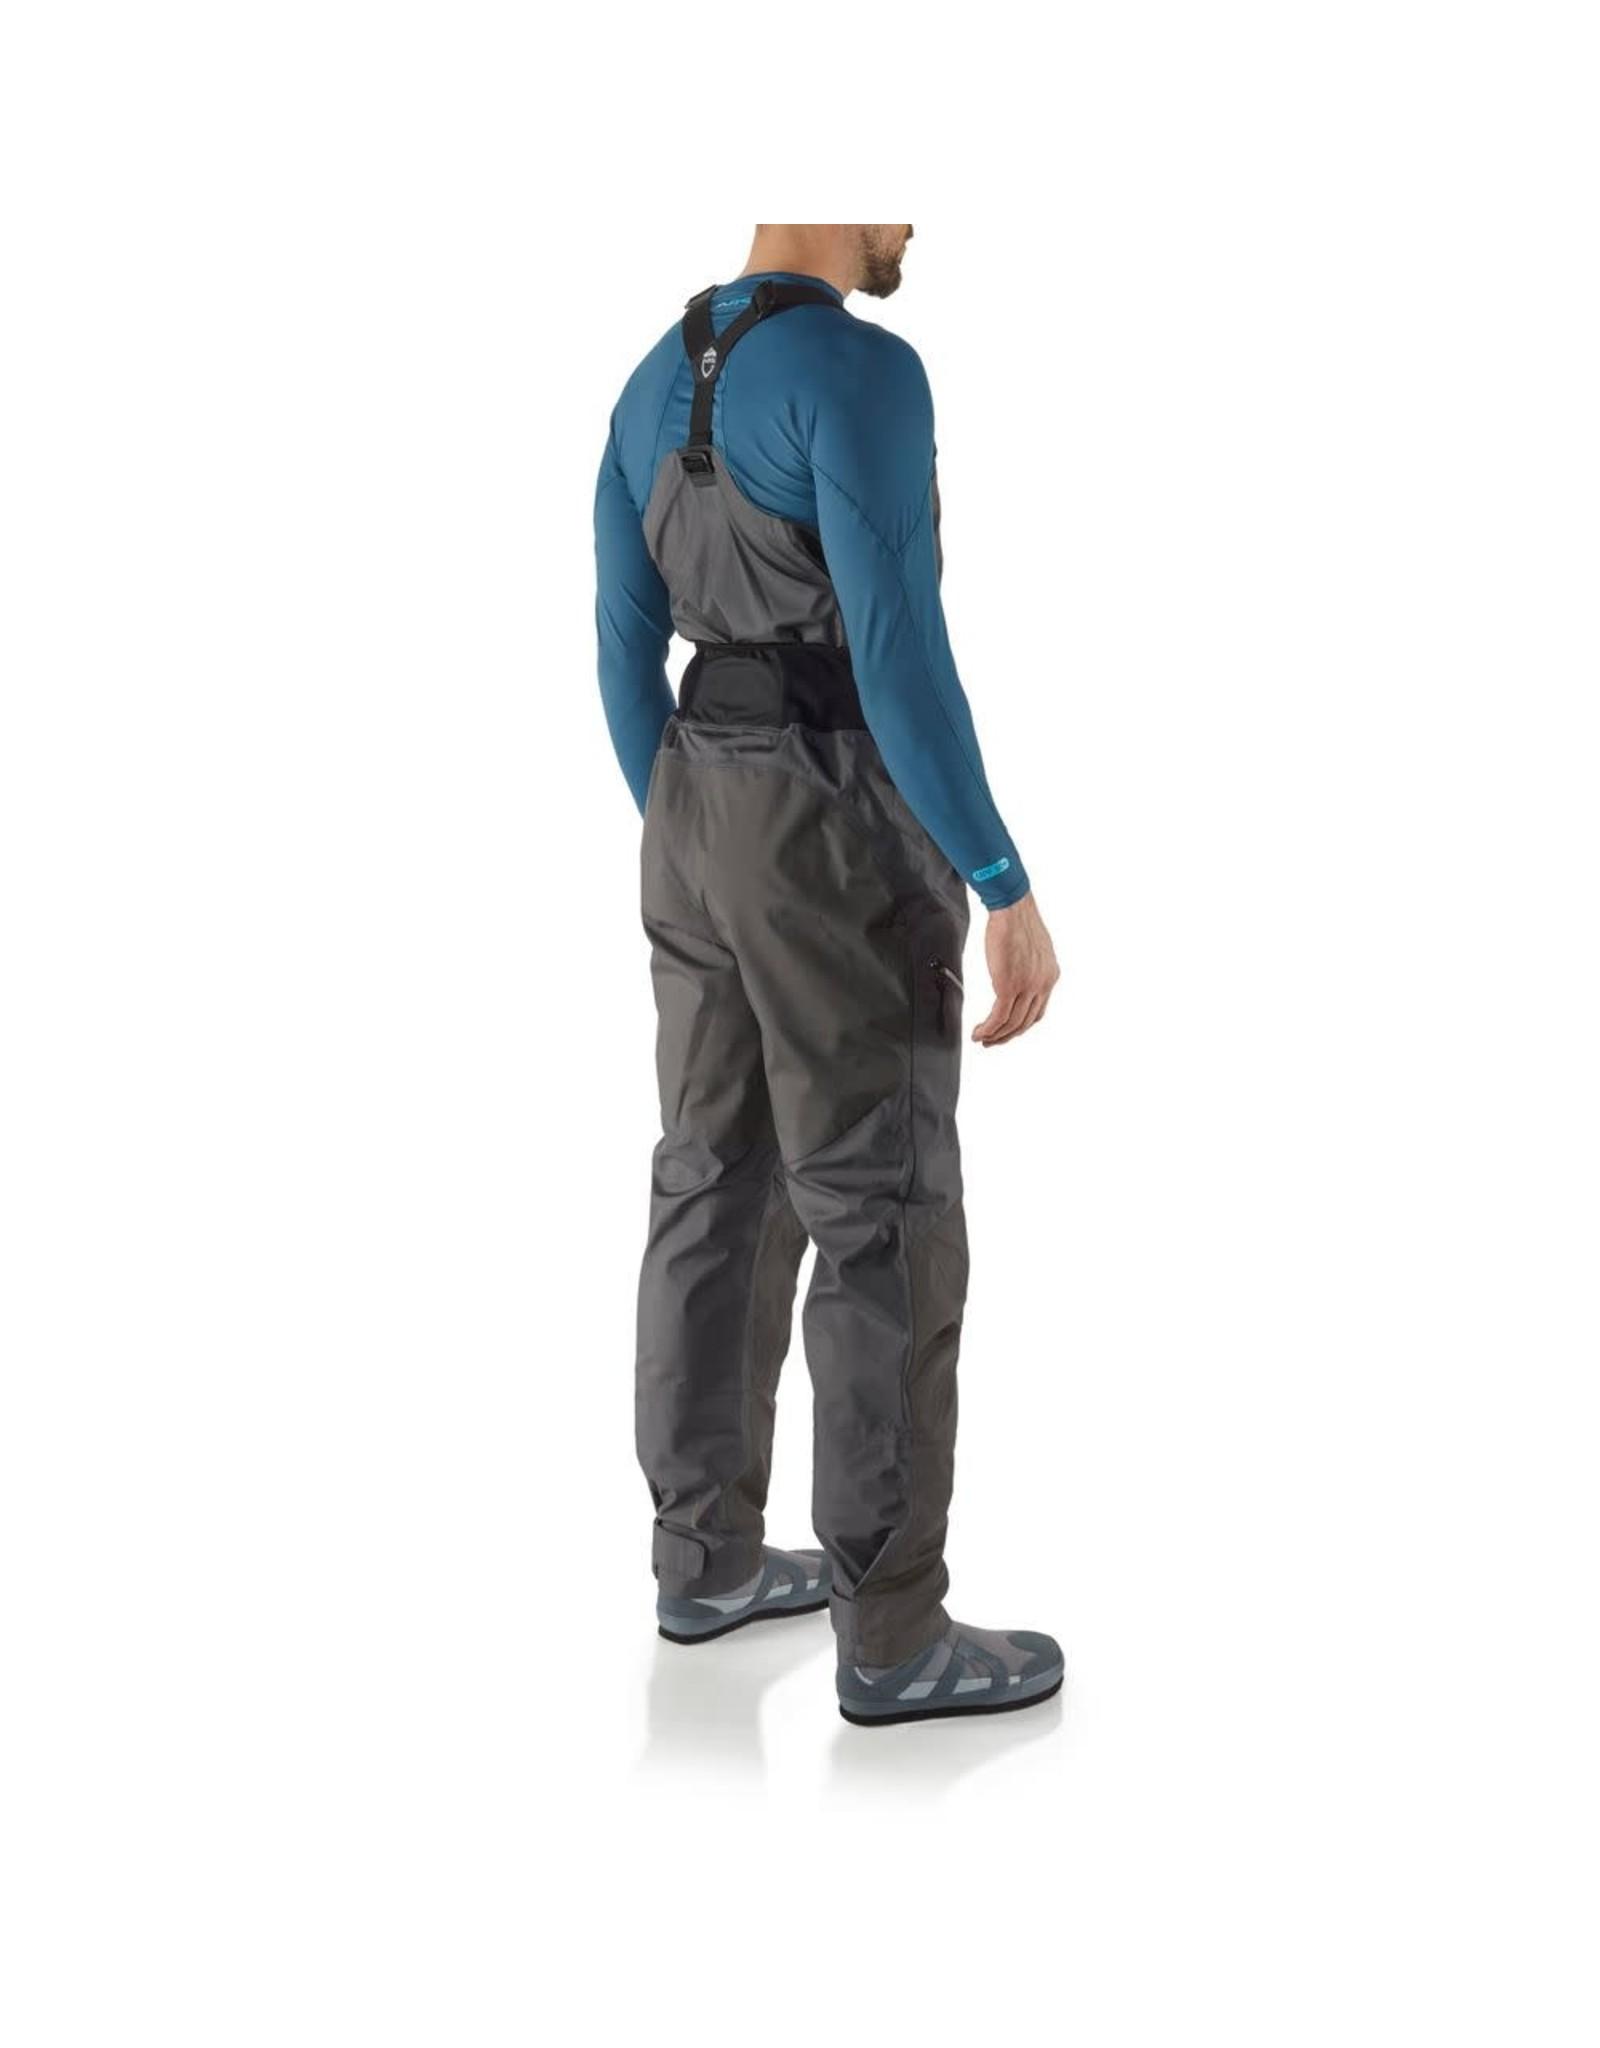 NRS NRS Pantalon étanche Sidewinder Bib